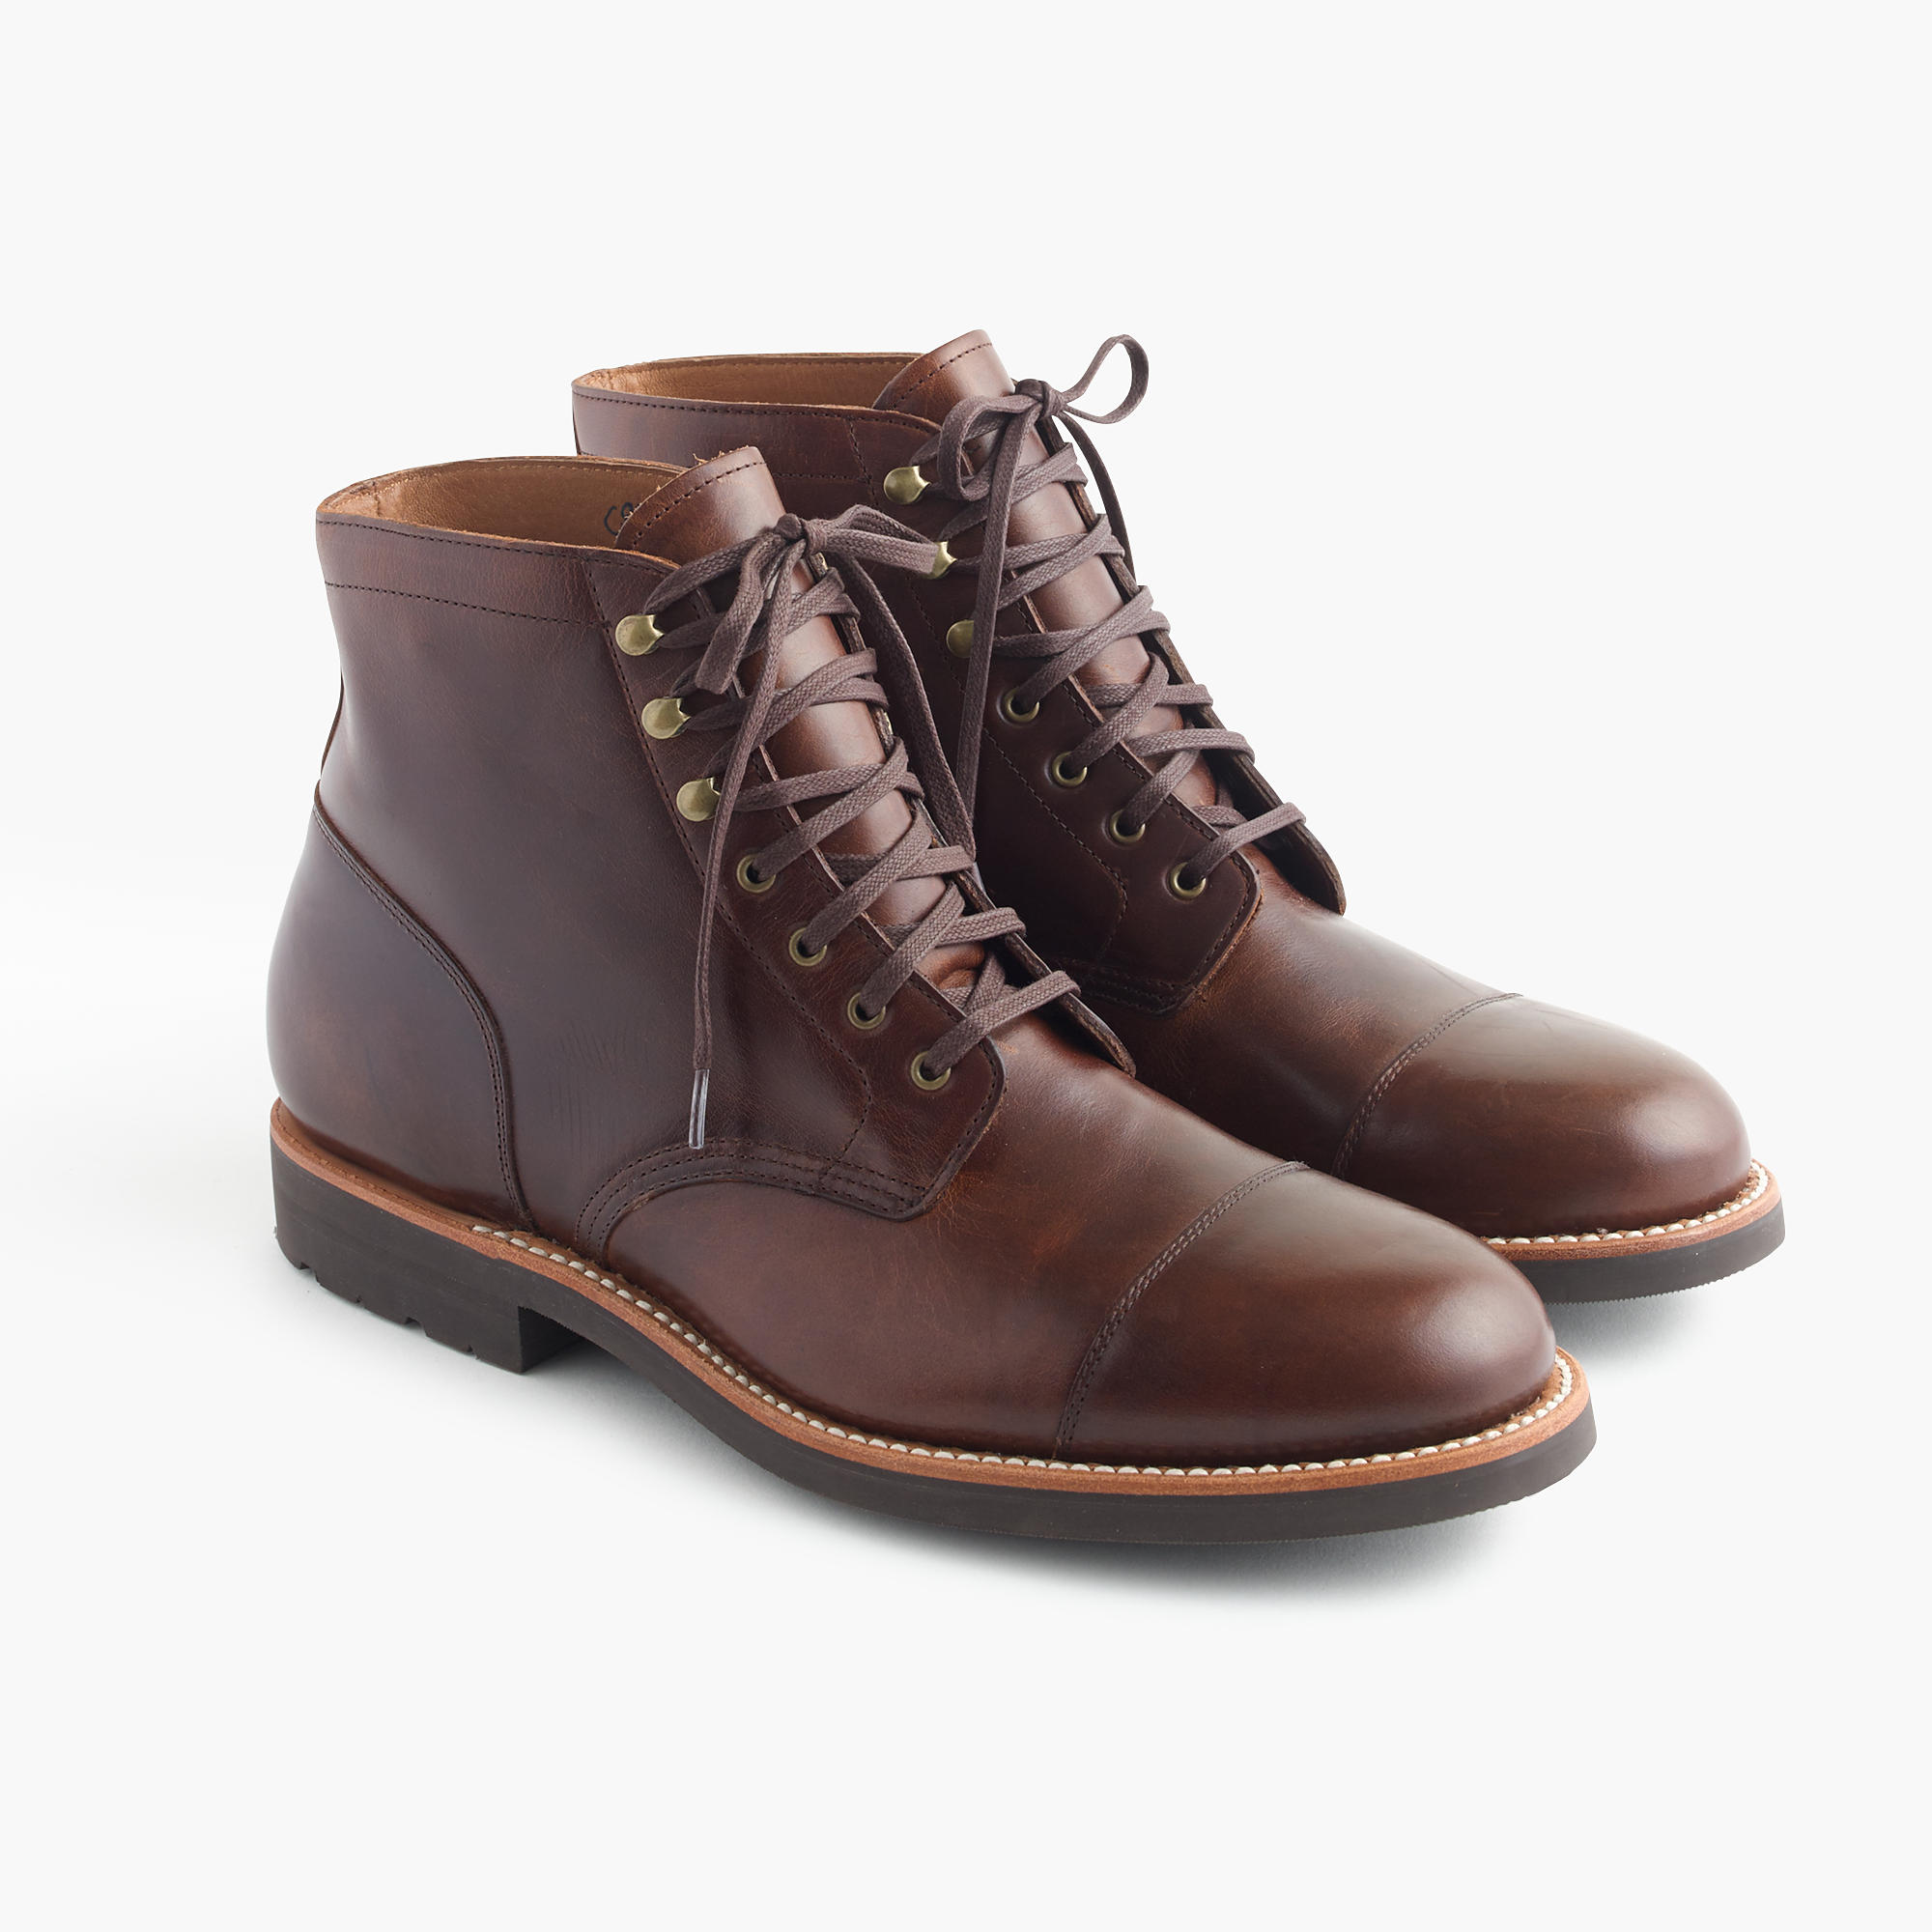 Kenton leather cap-toe boots : Men boots | J.Crew